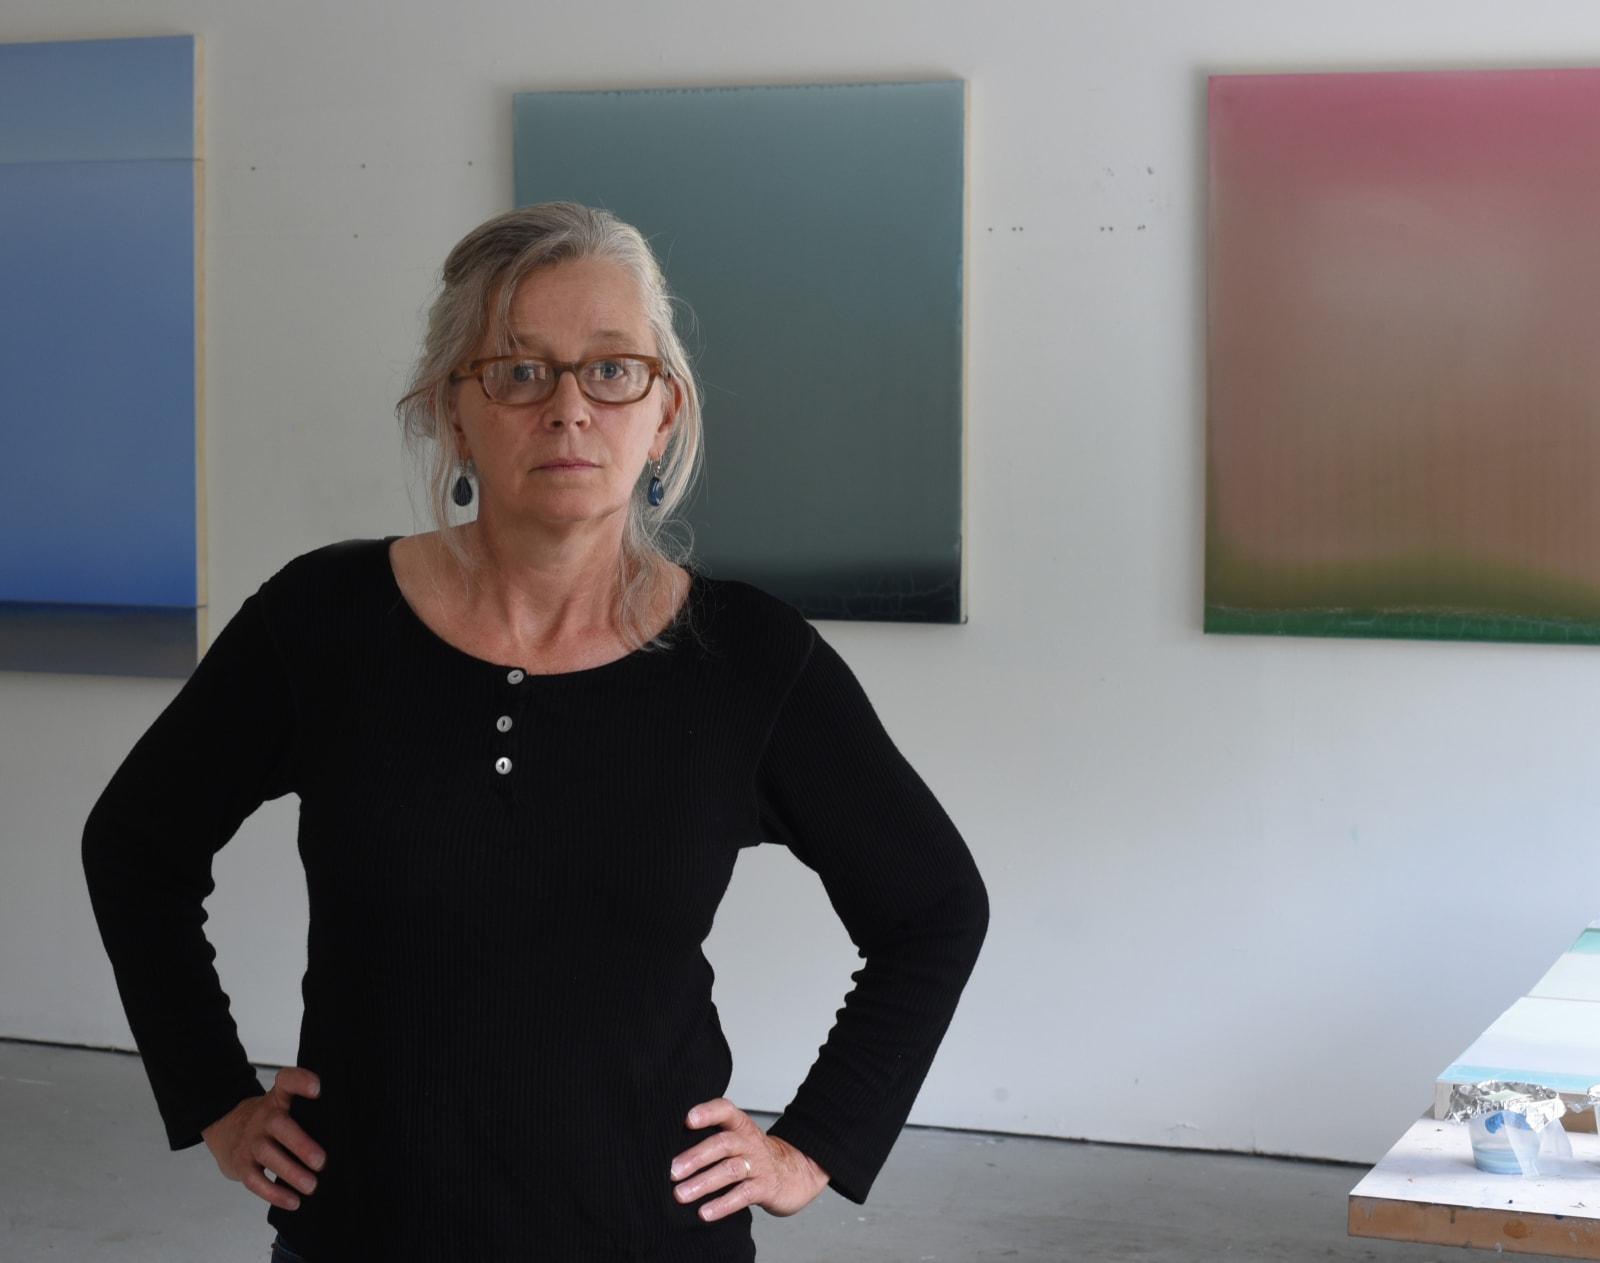 Susan English in her studio, photo credit: Dmitri Kasterine